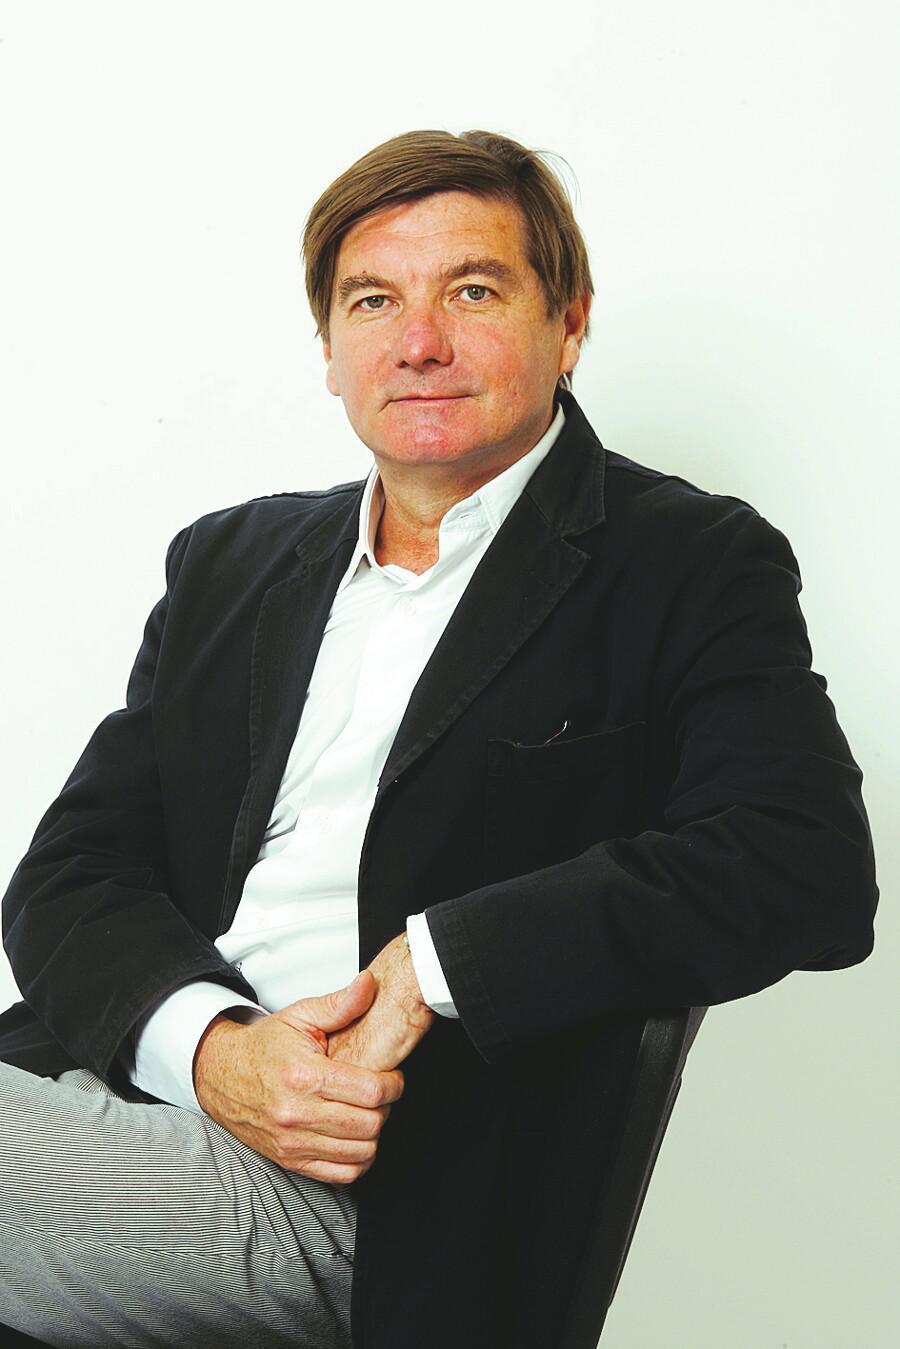 Eric Neuhoff